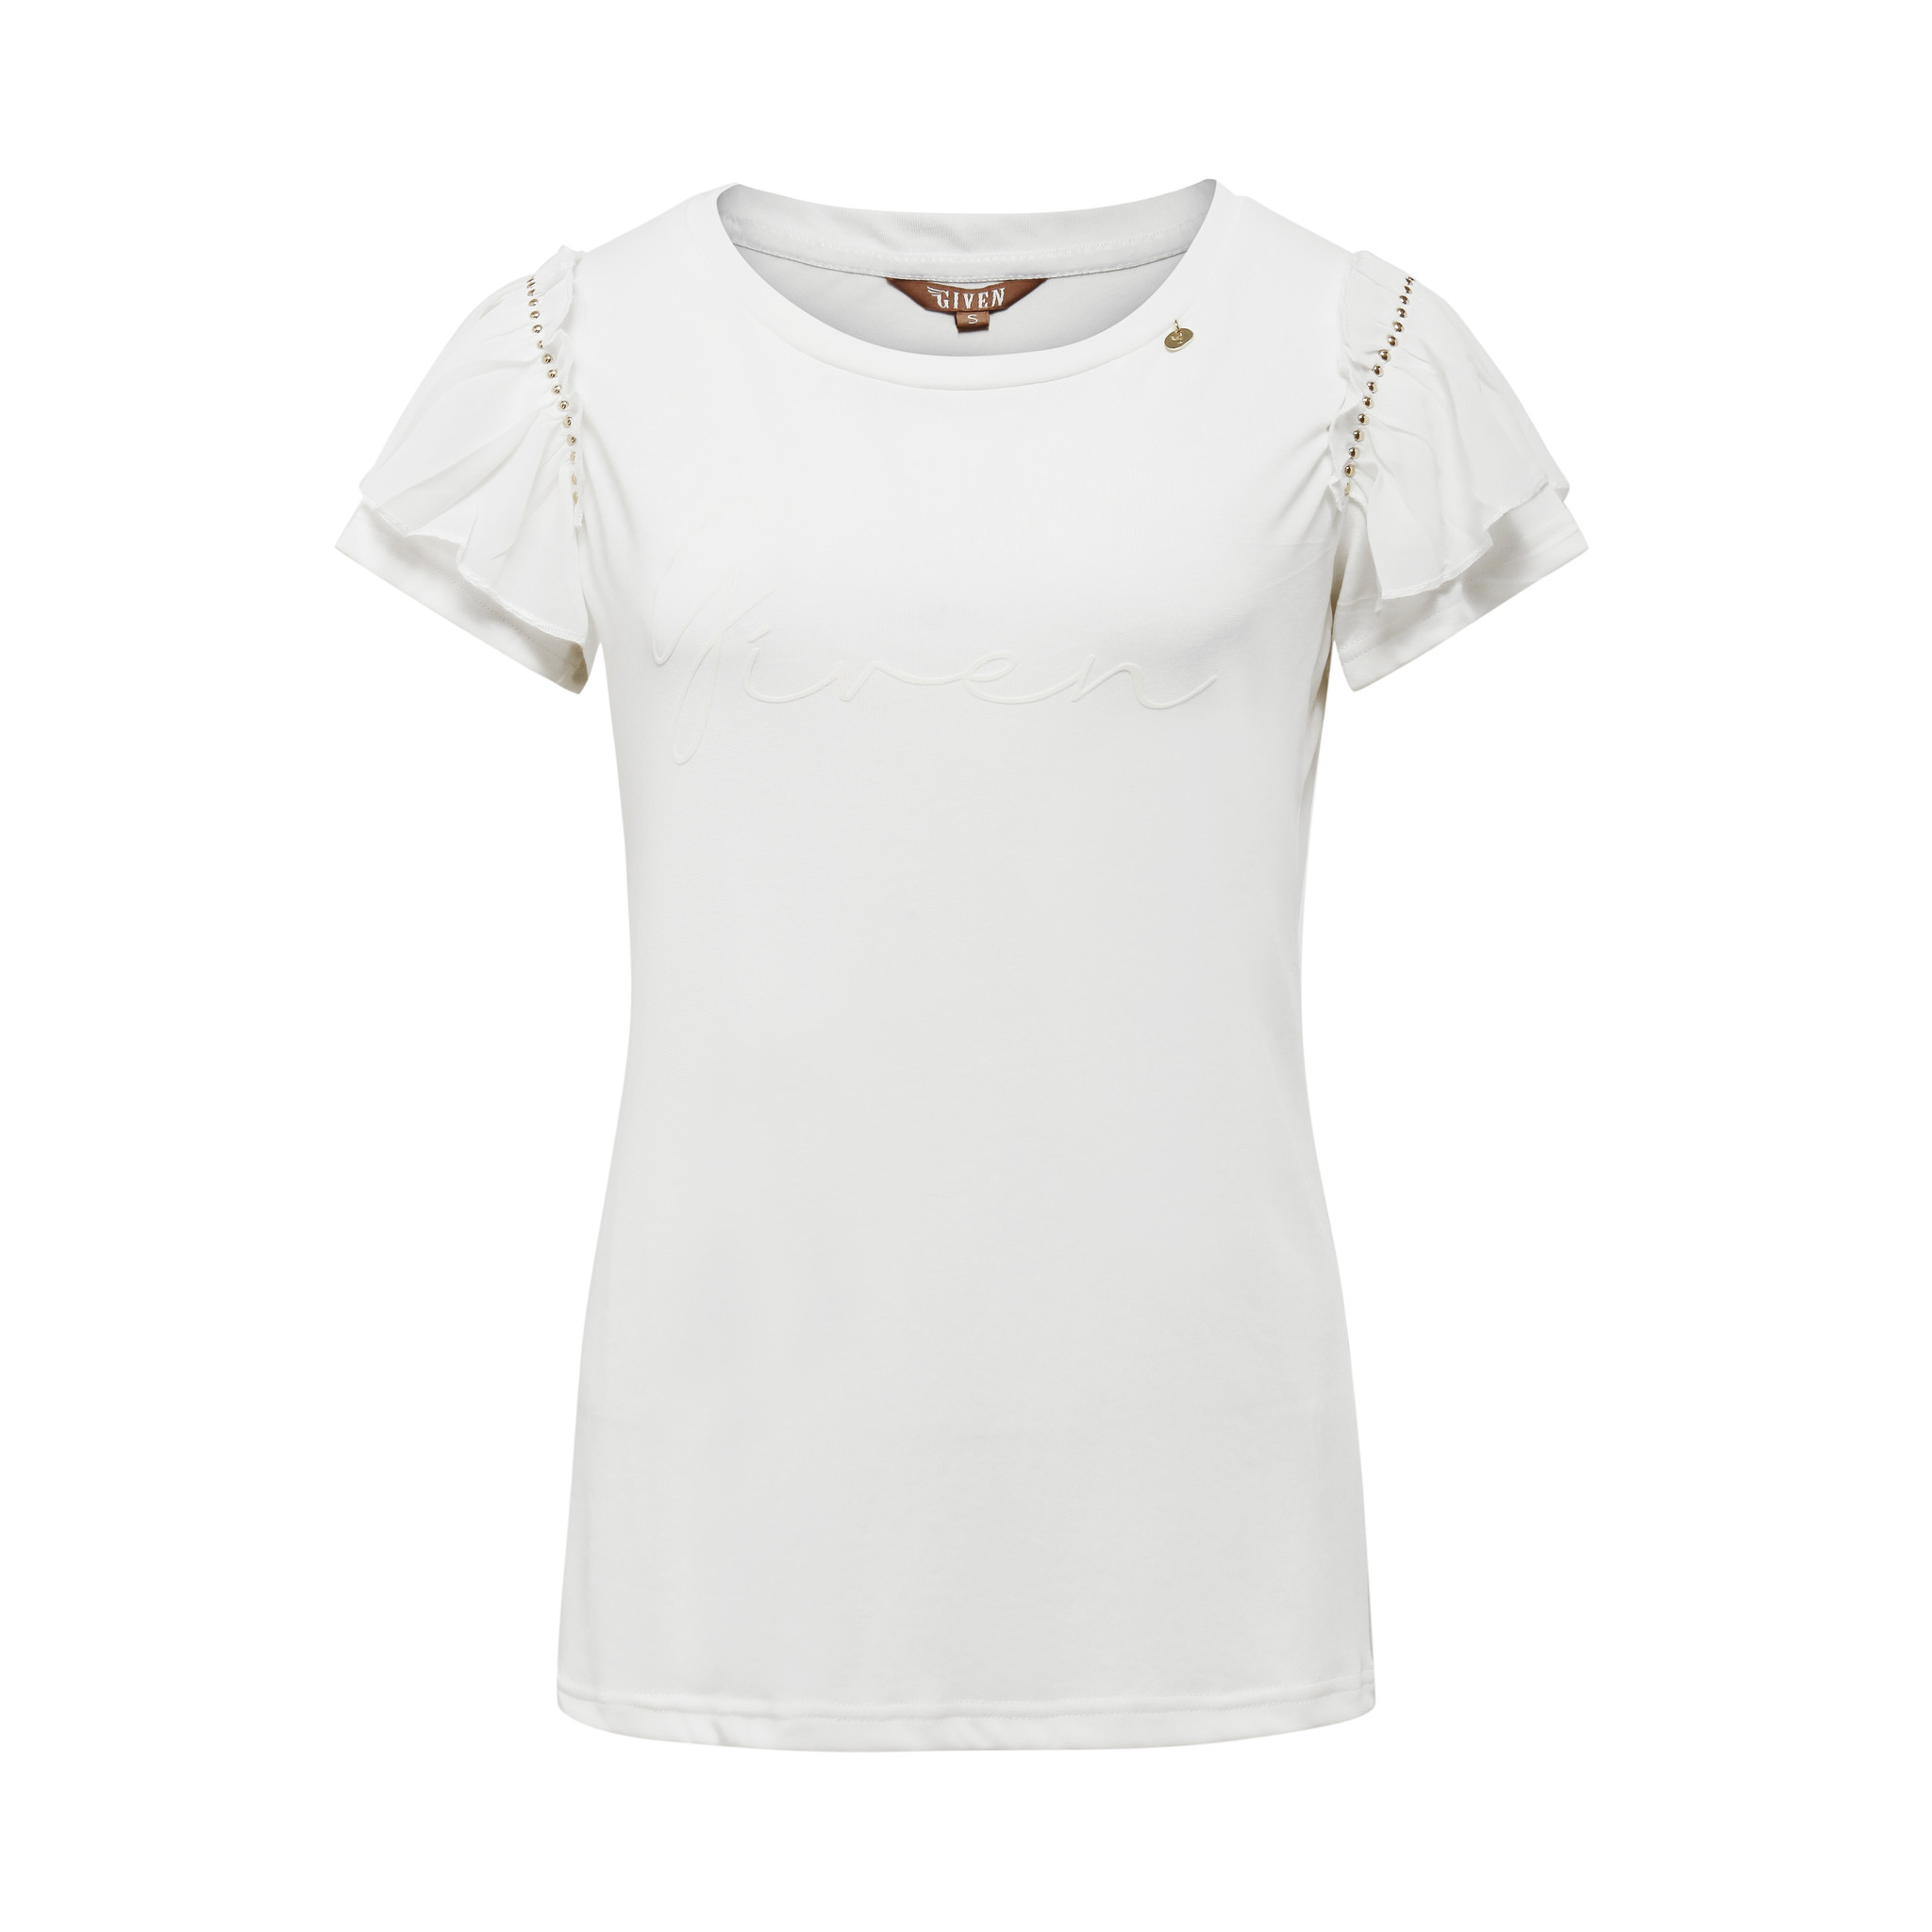 T-shirt Given Maris creme GW129107